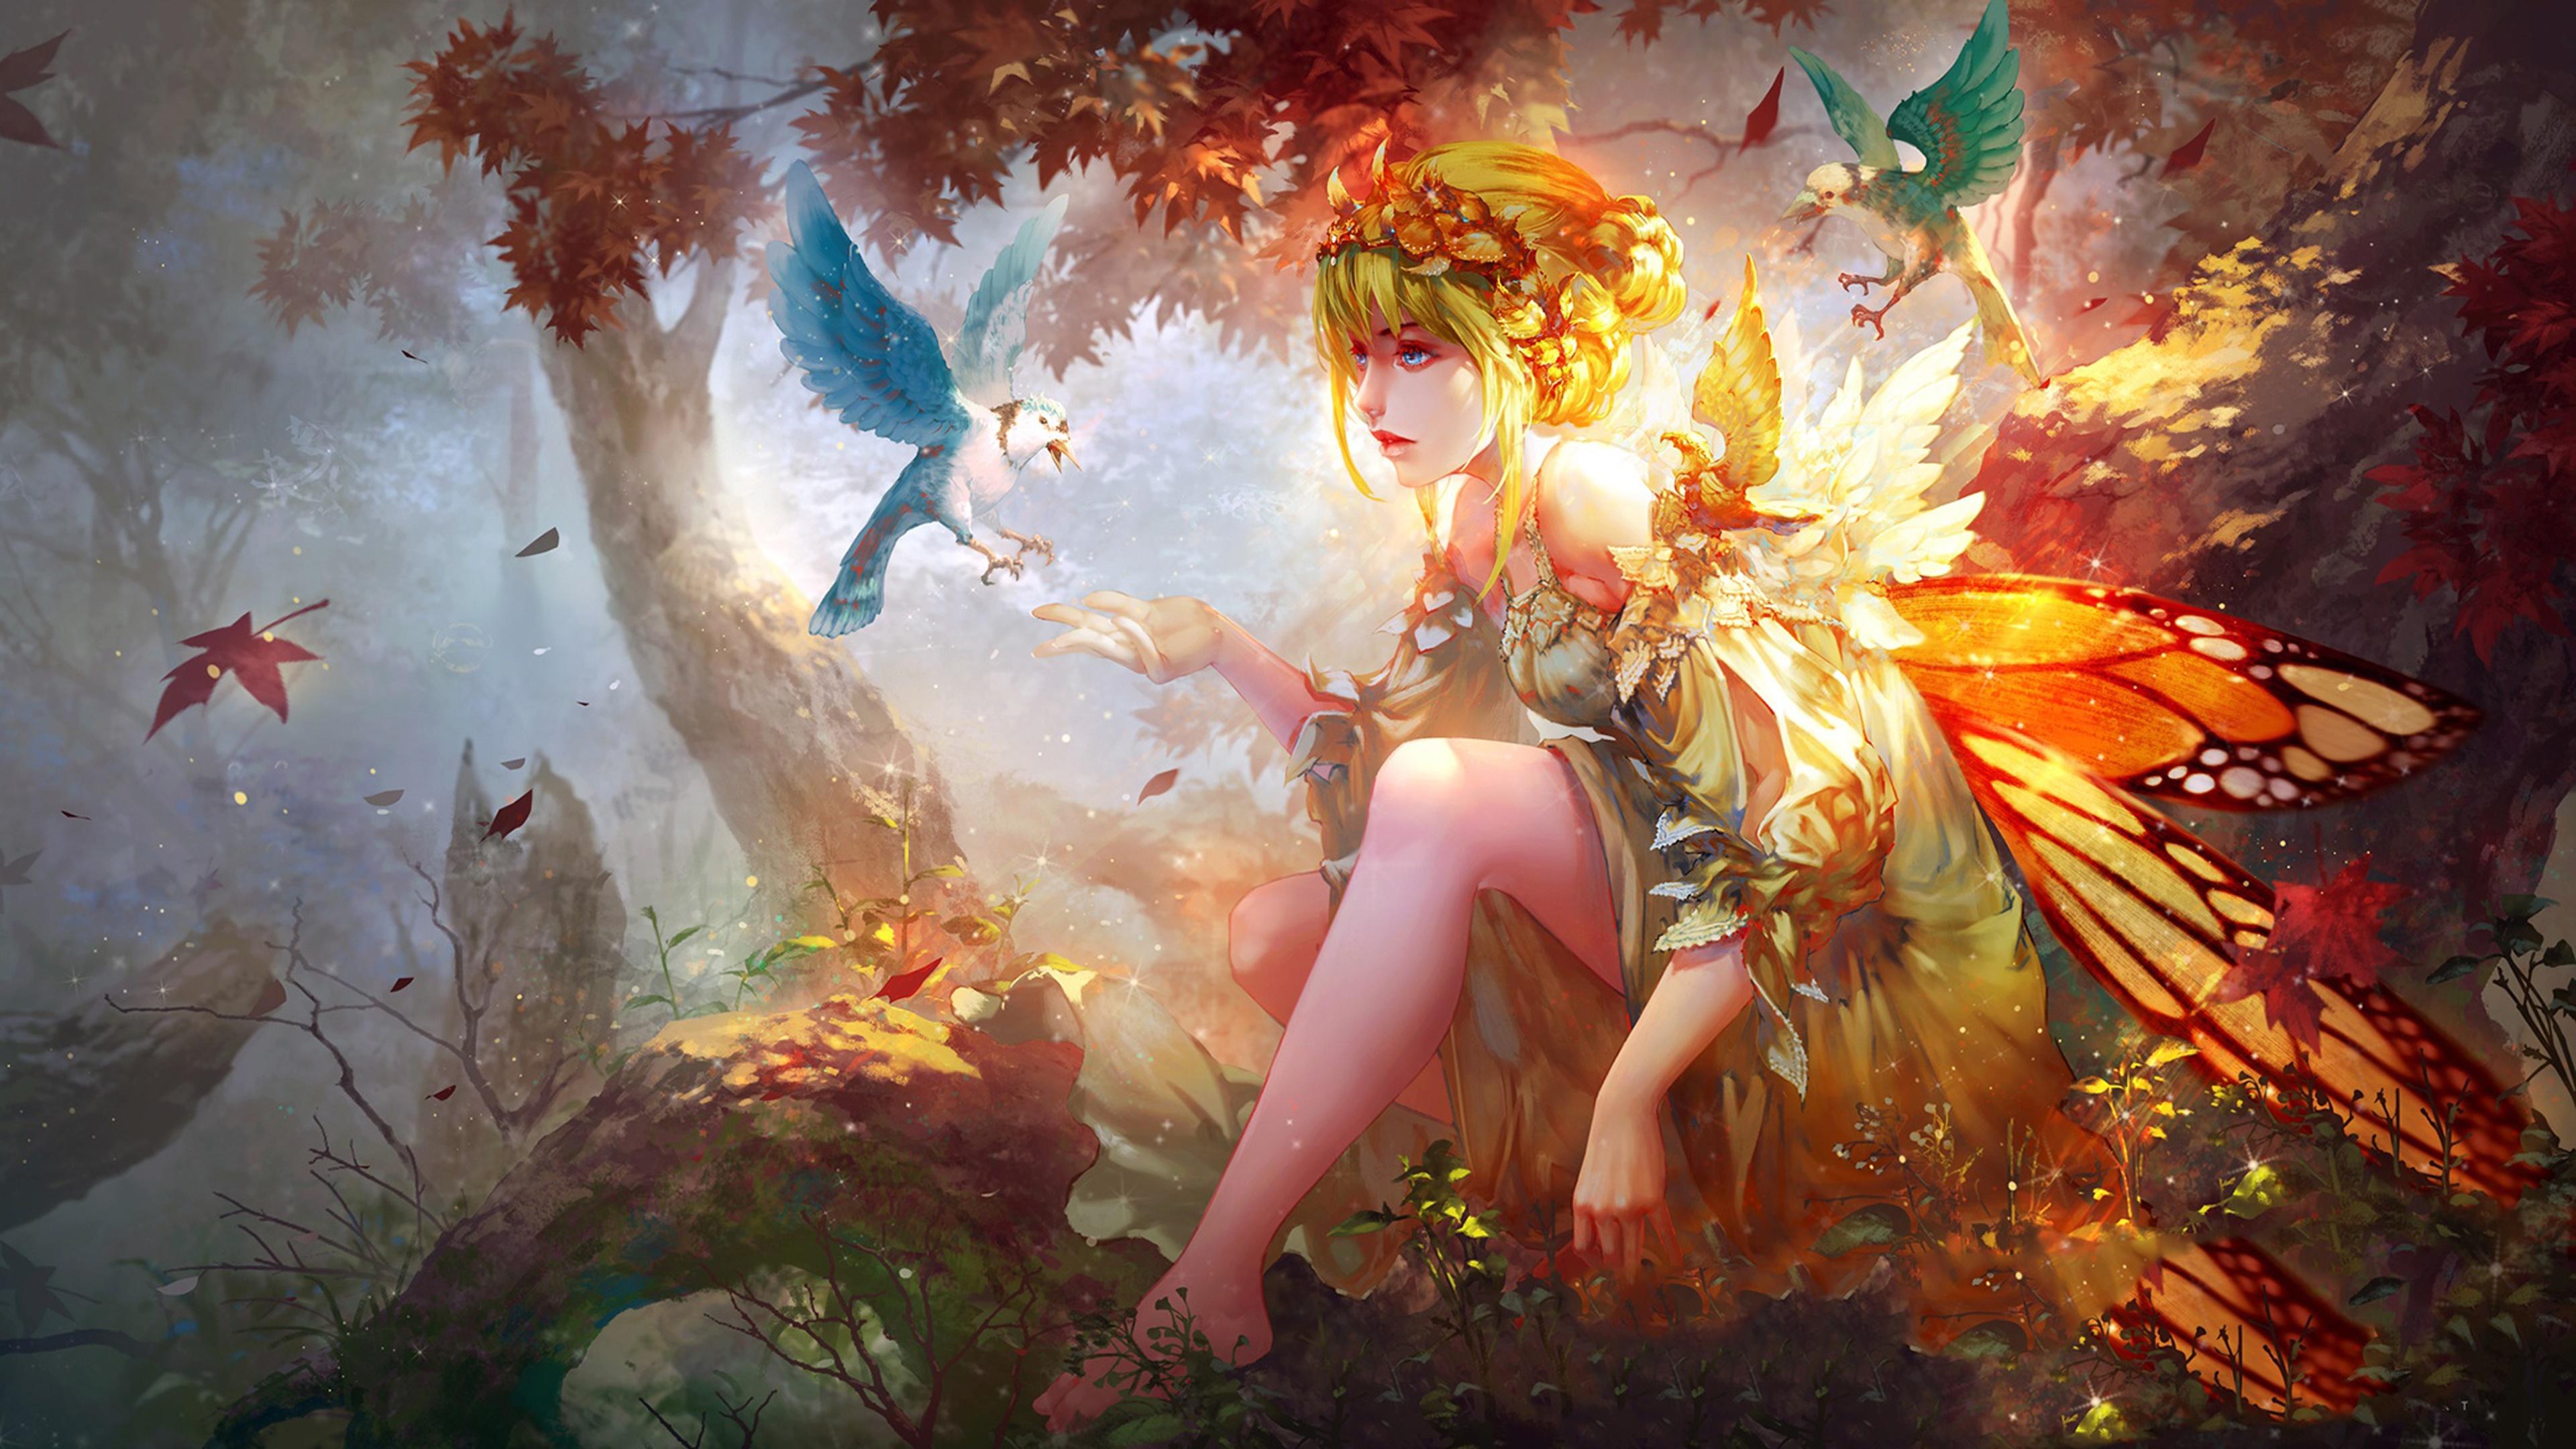 Fairy tale forest wallpaper